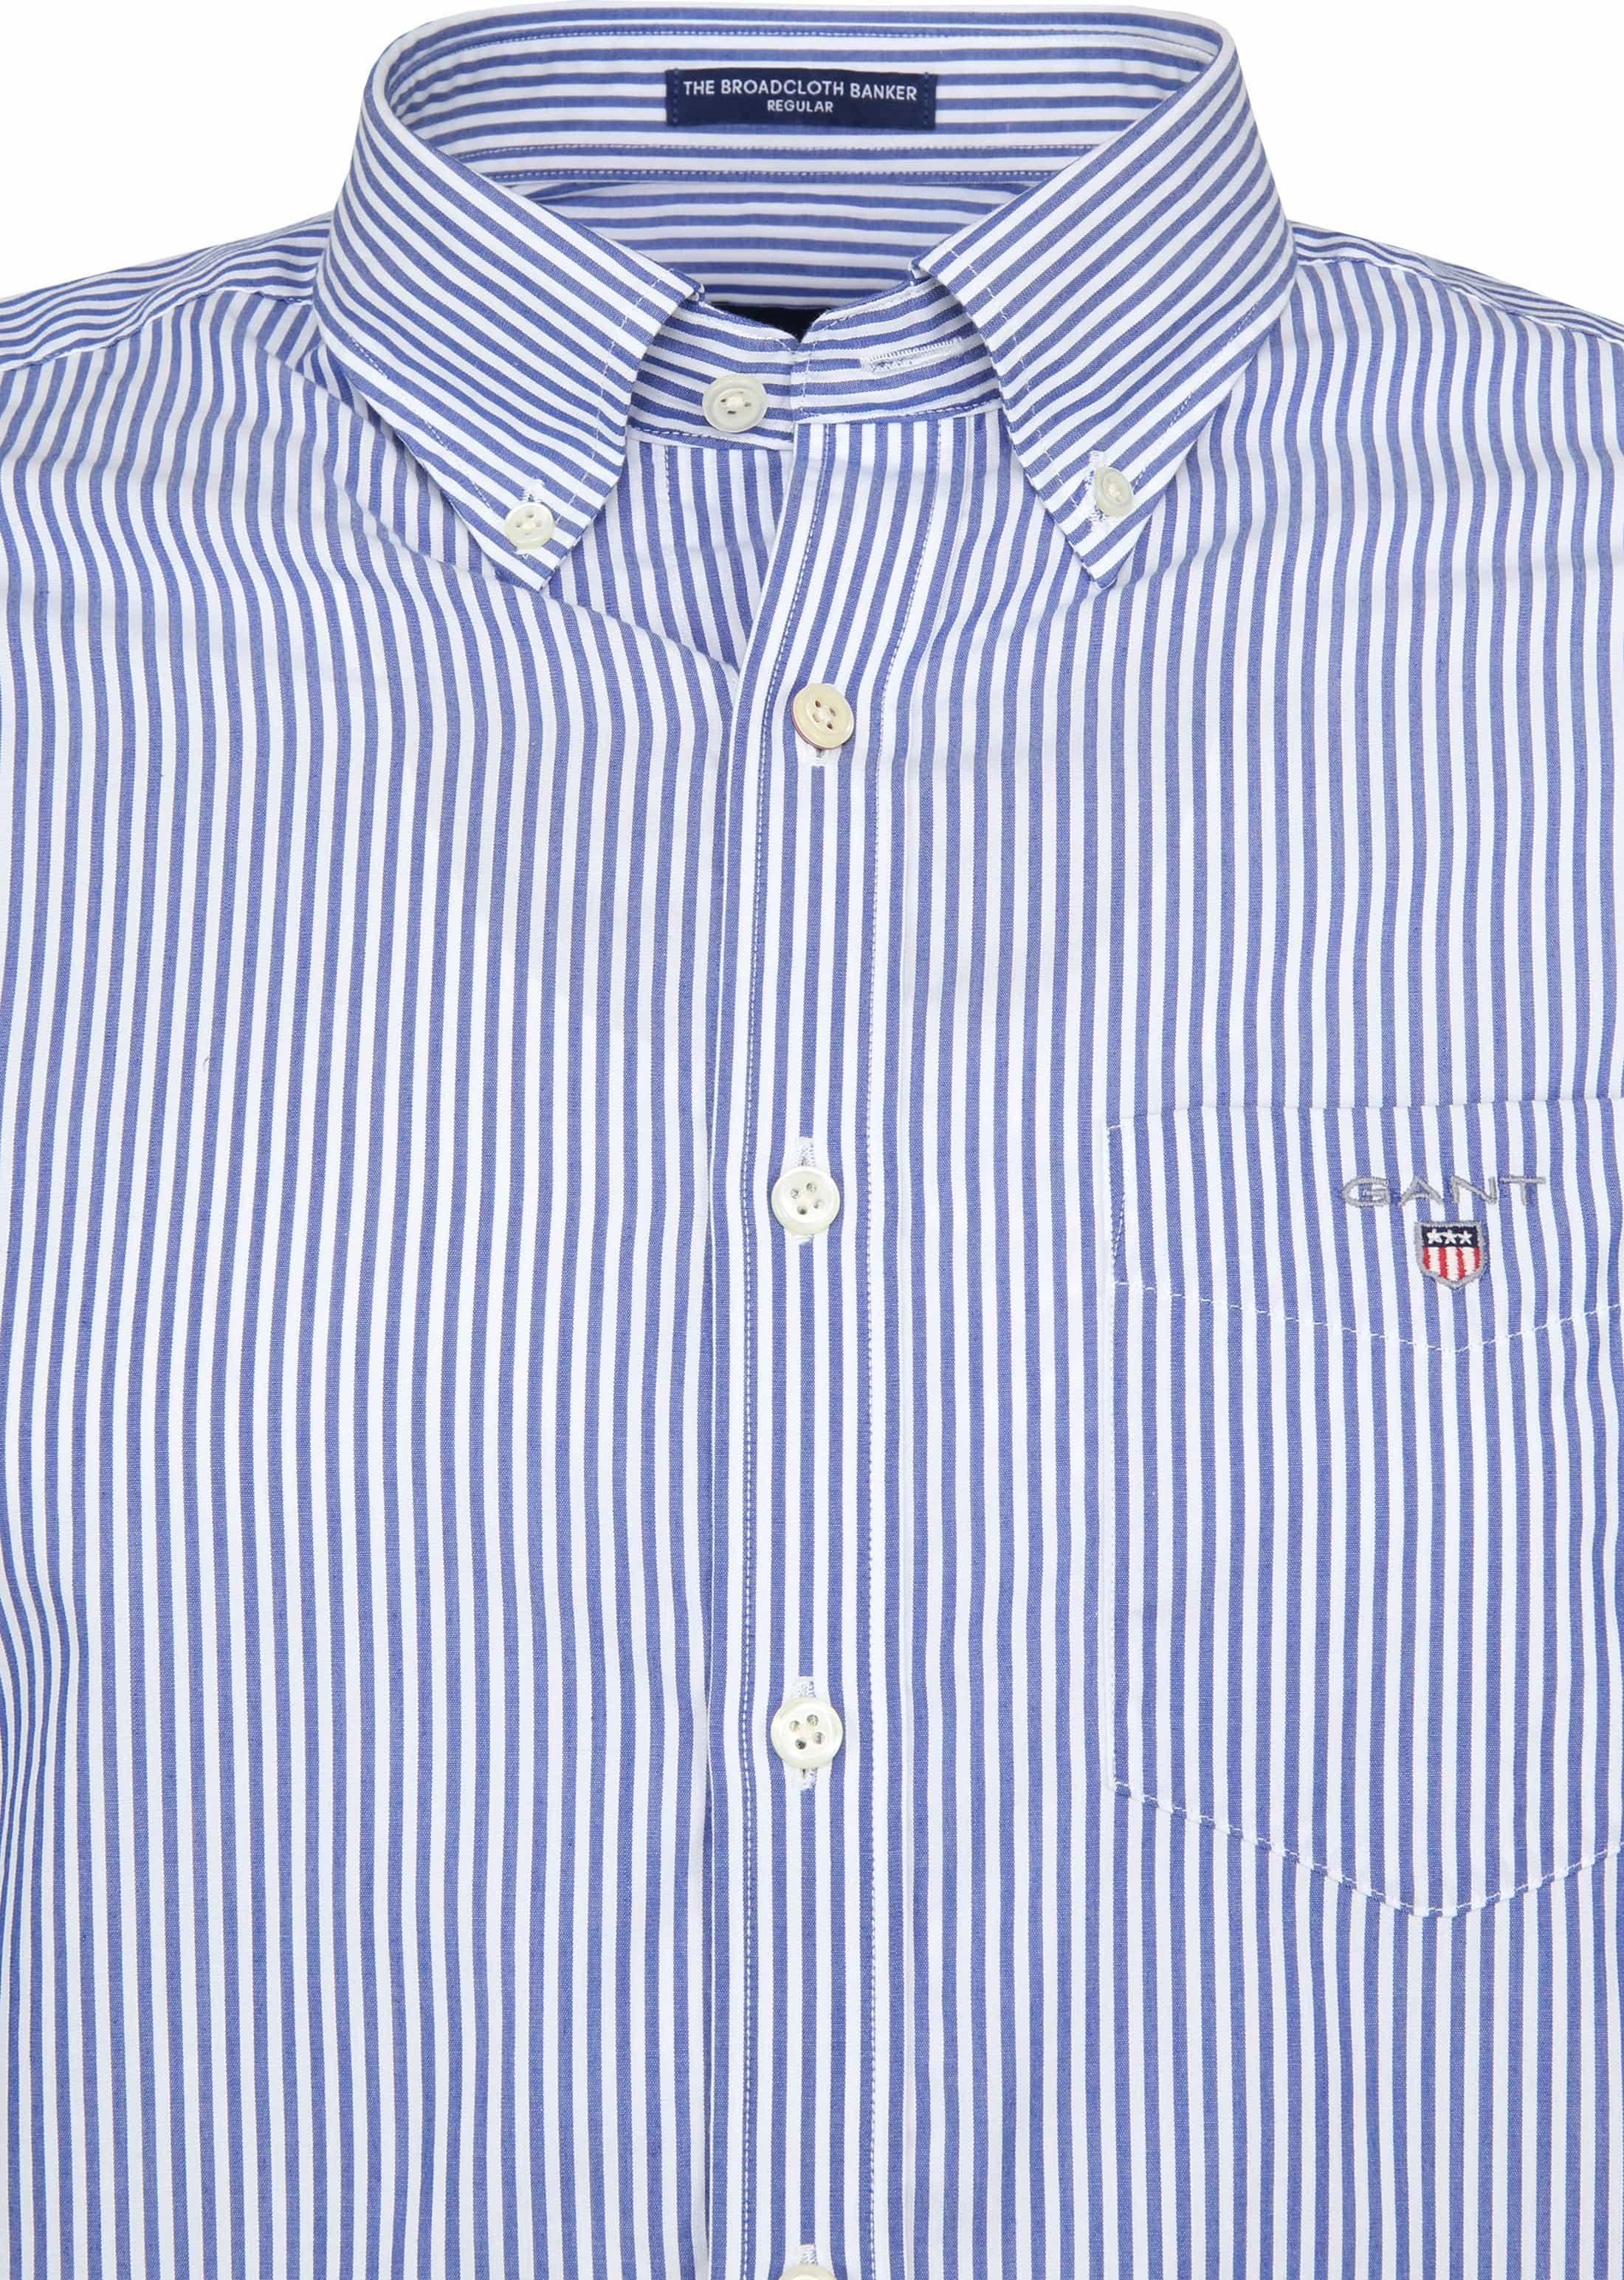 Gant Casual Shirt Stripes Blue foto 2